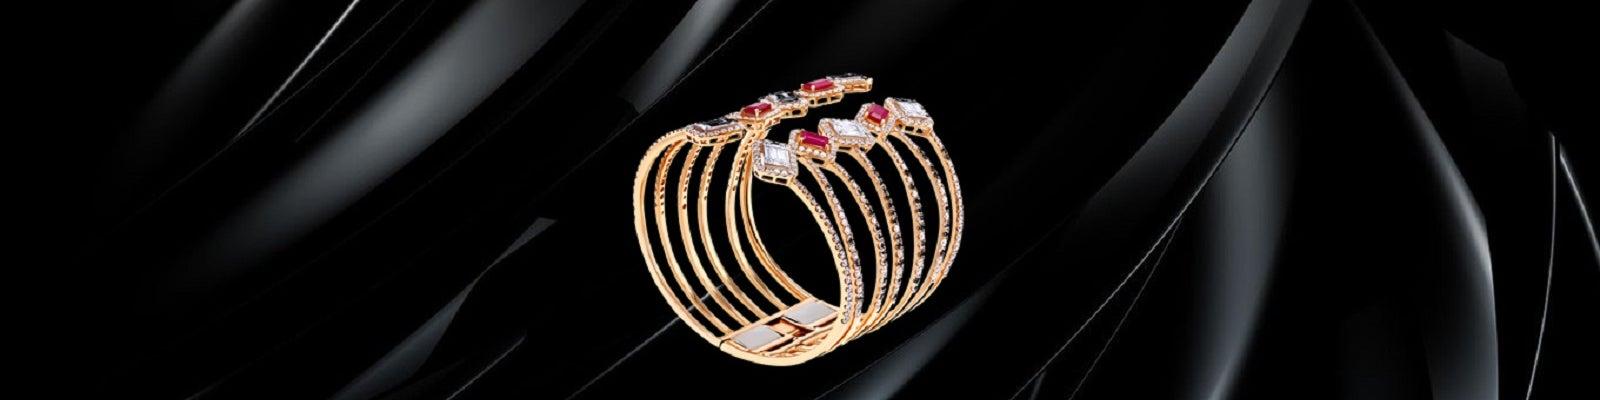 Amwaj Jewellery